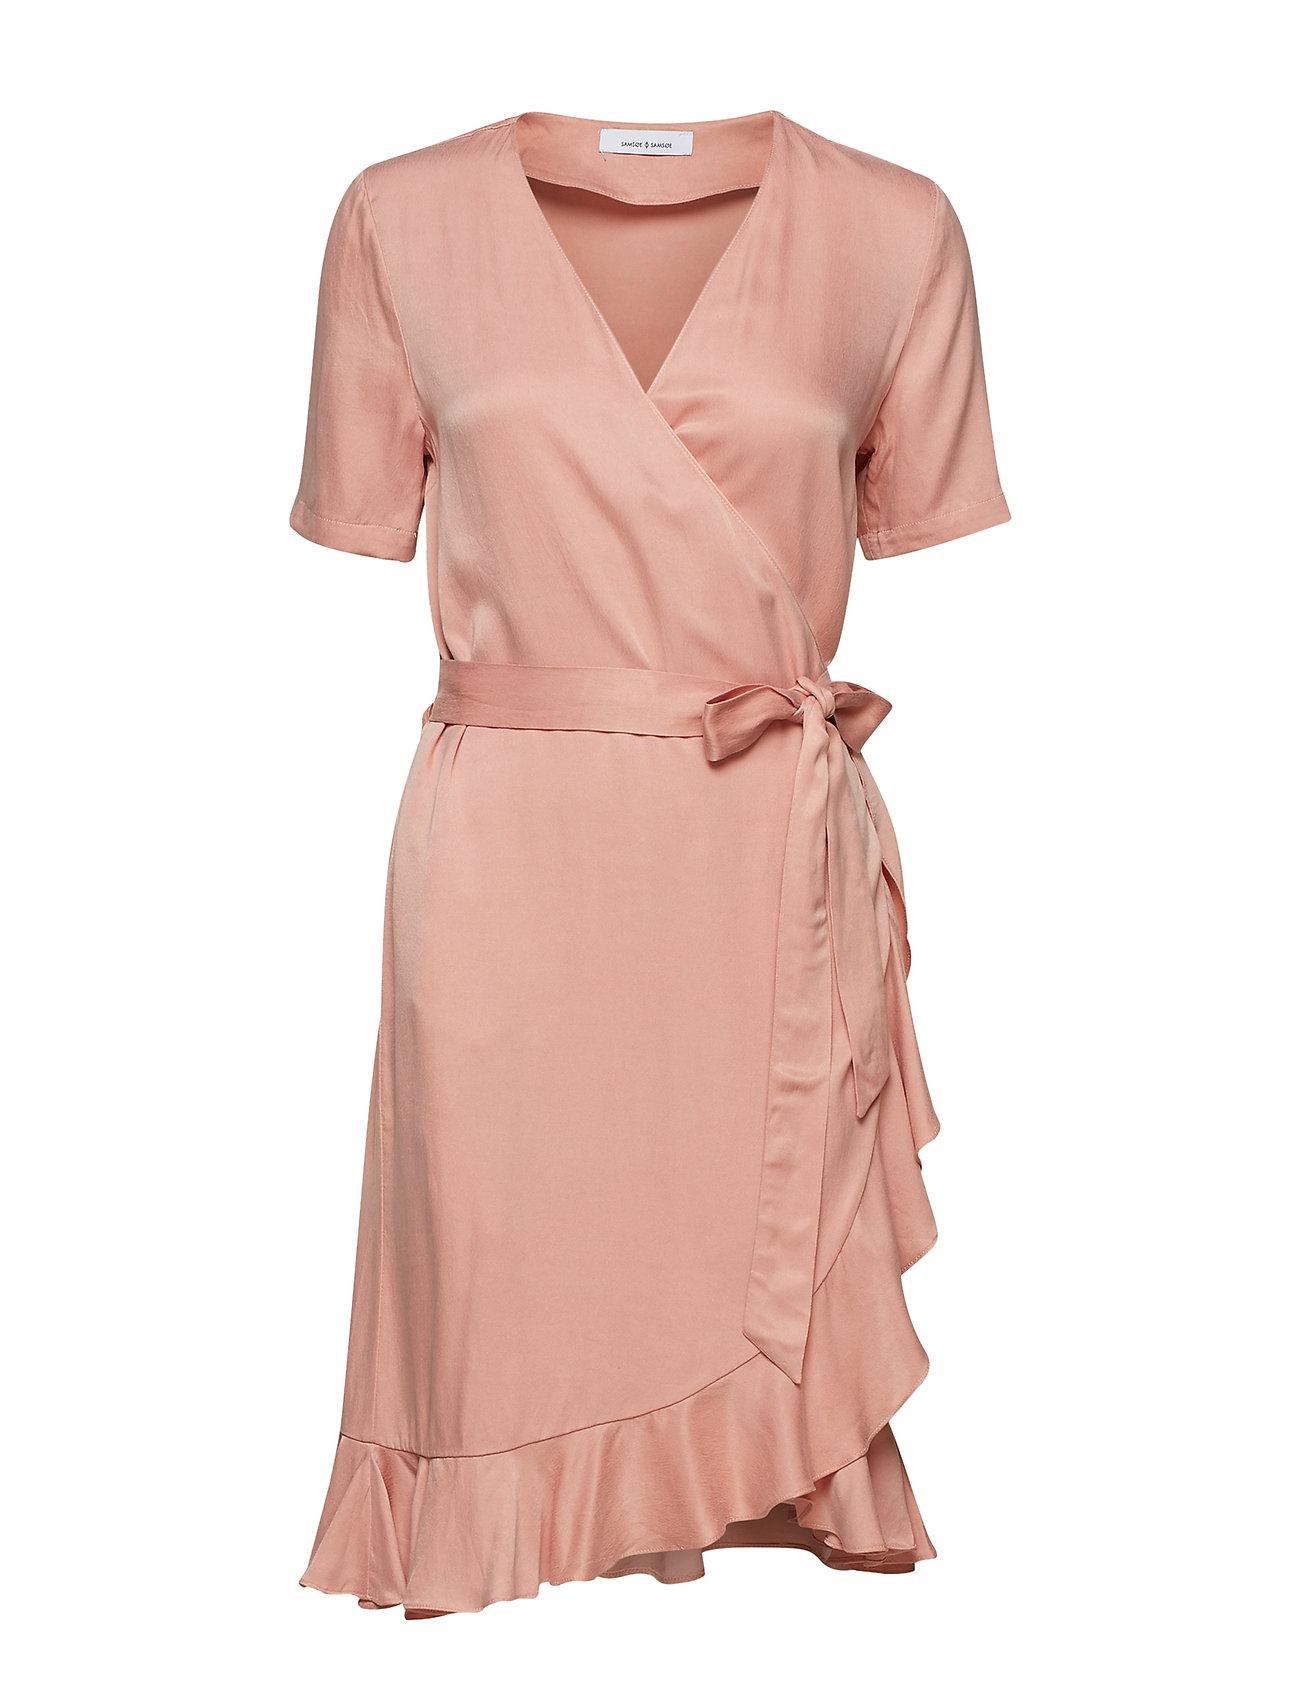 cc7ce4dd Limon Ss Dress 9941 (Rose Tan) (630 kr) - Samsøe & Samsøe - | Boozt.com